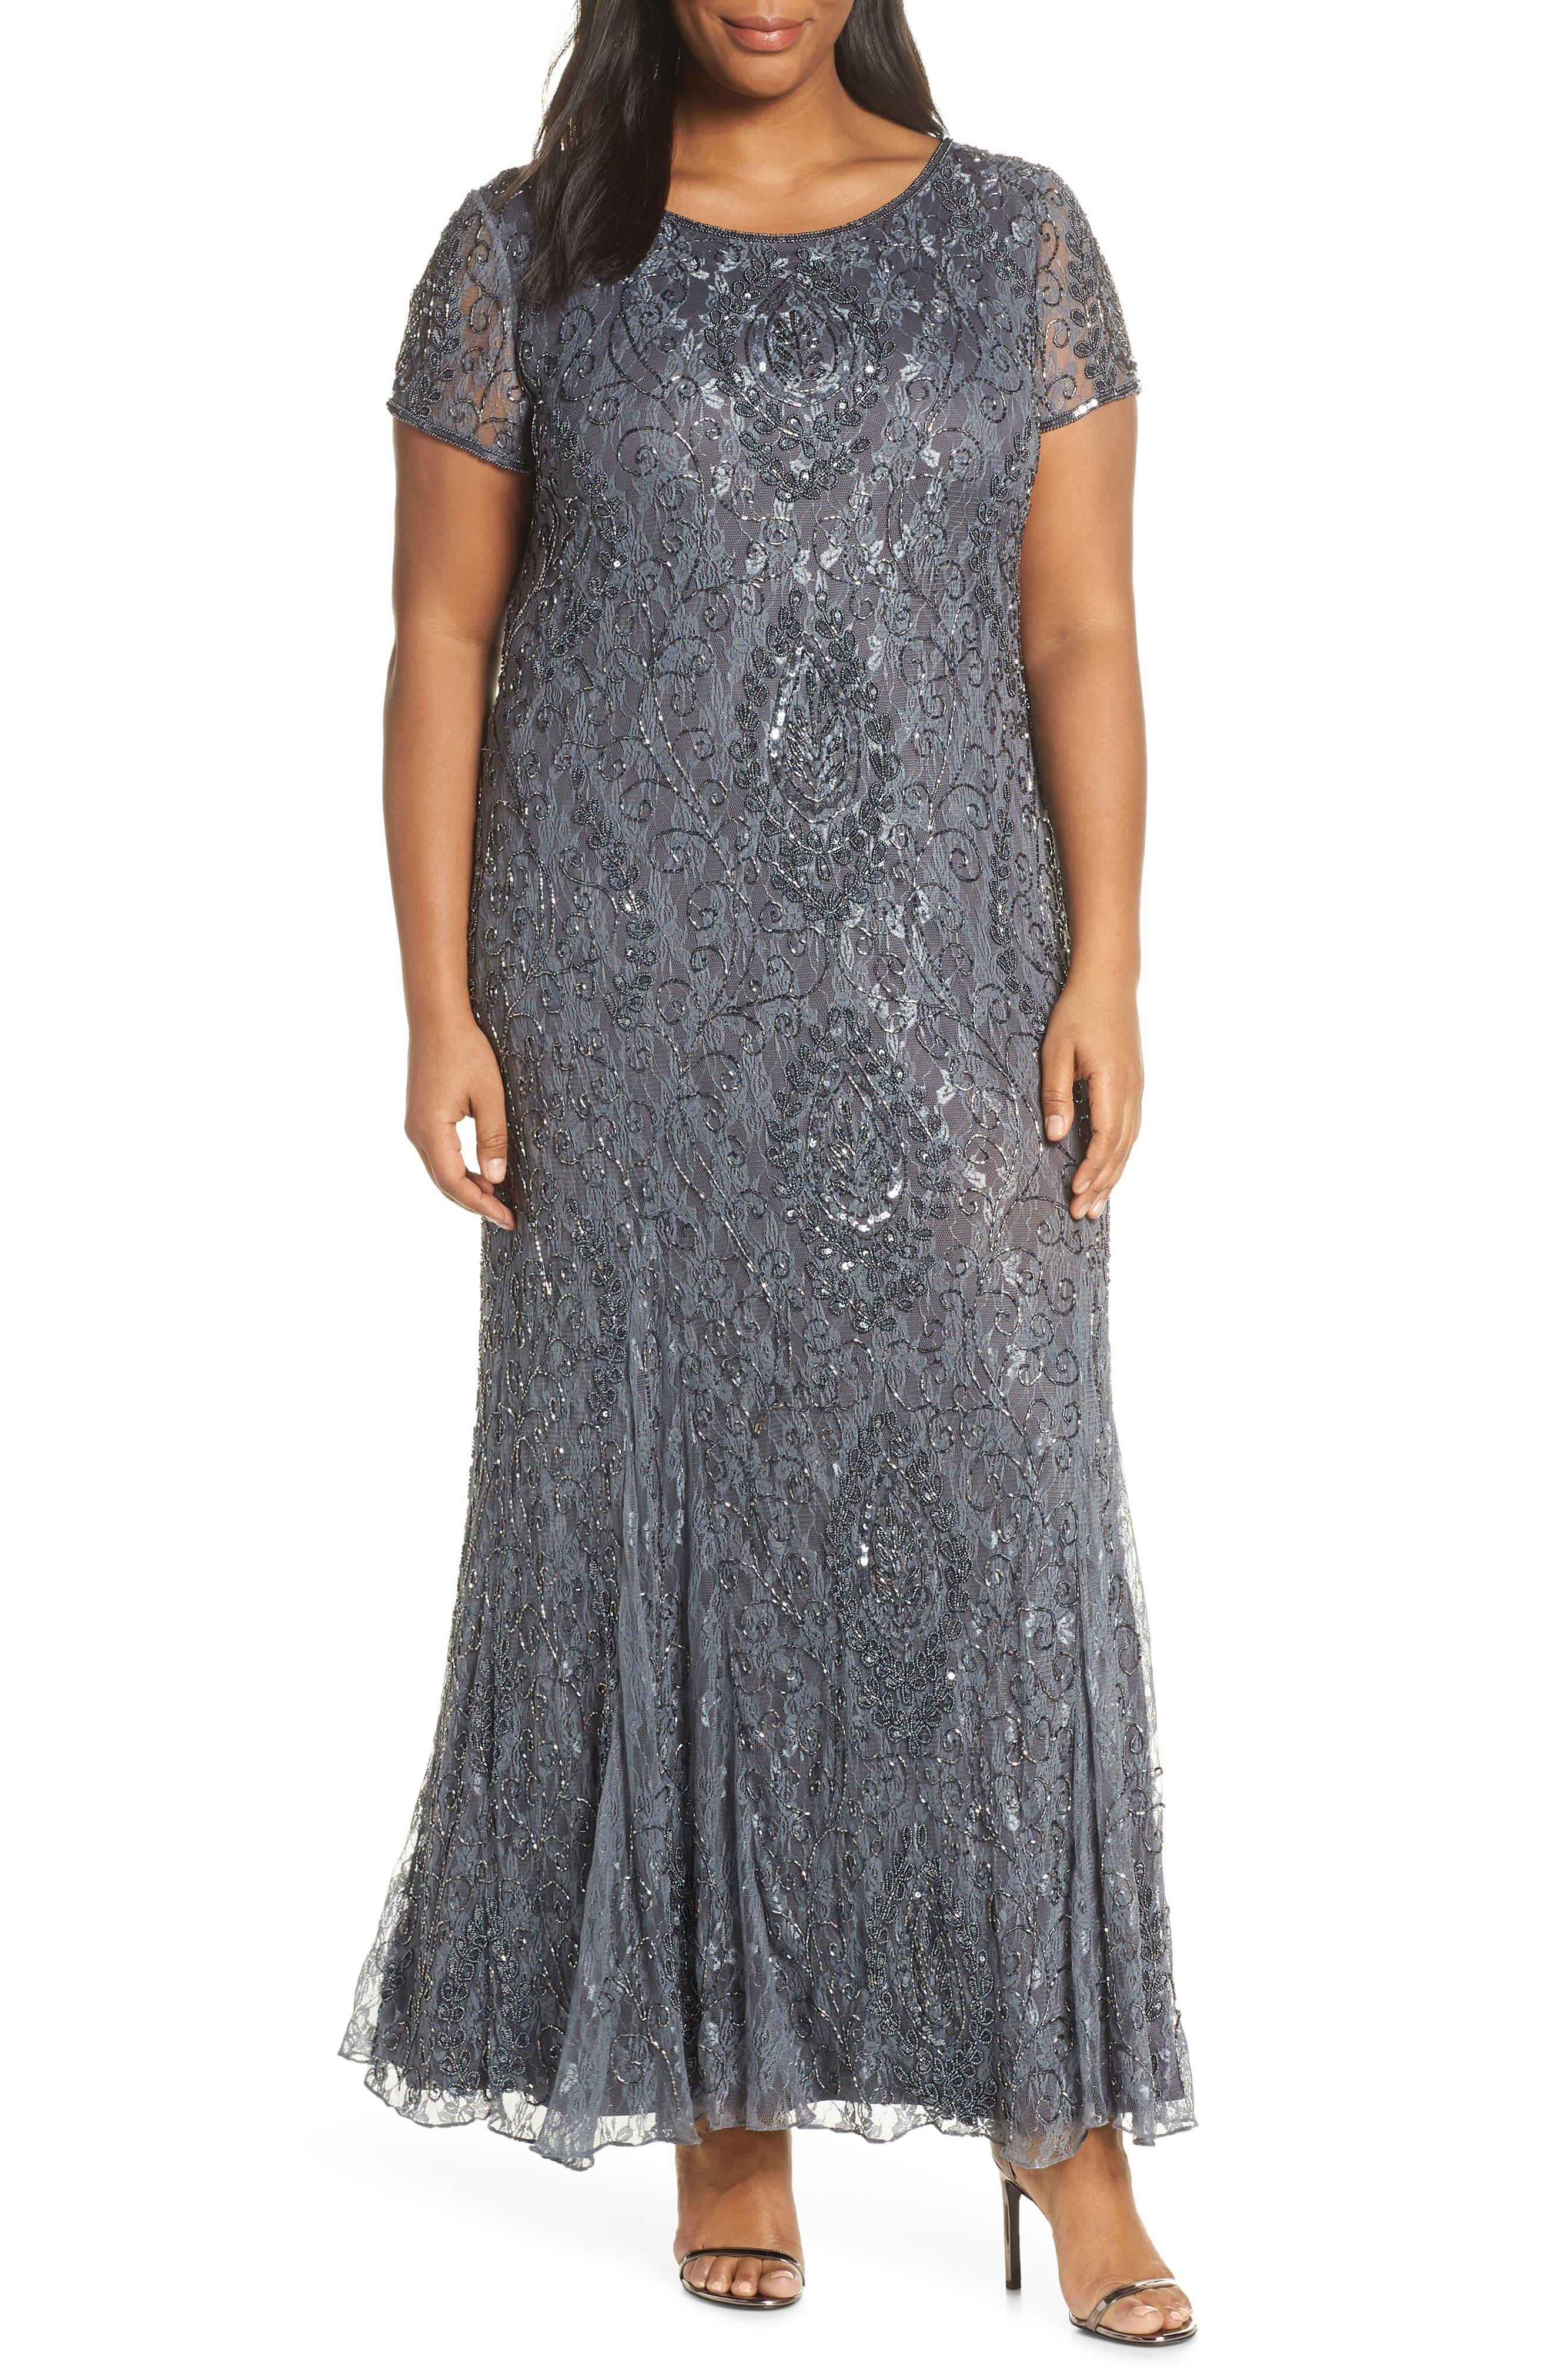 Plus Size Pisarro Nights Cap Sleeve Beaded Lace Dress, Grey